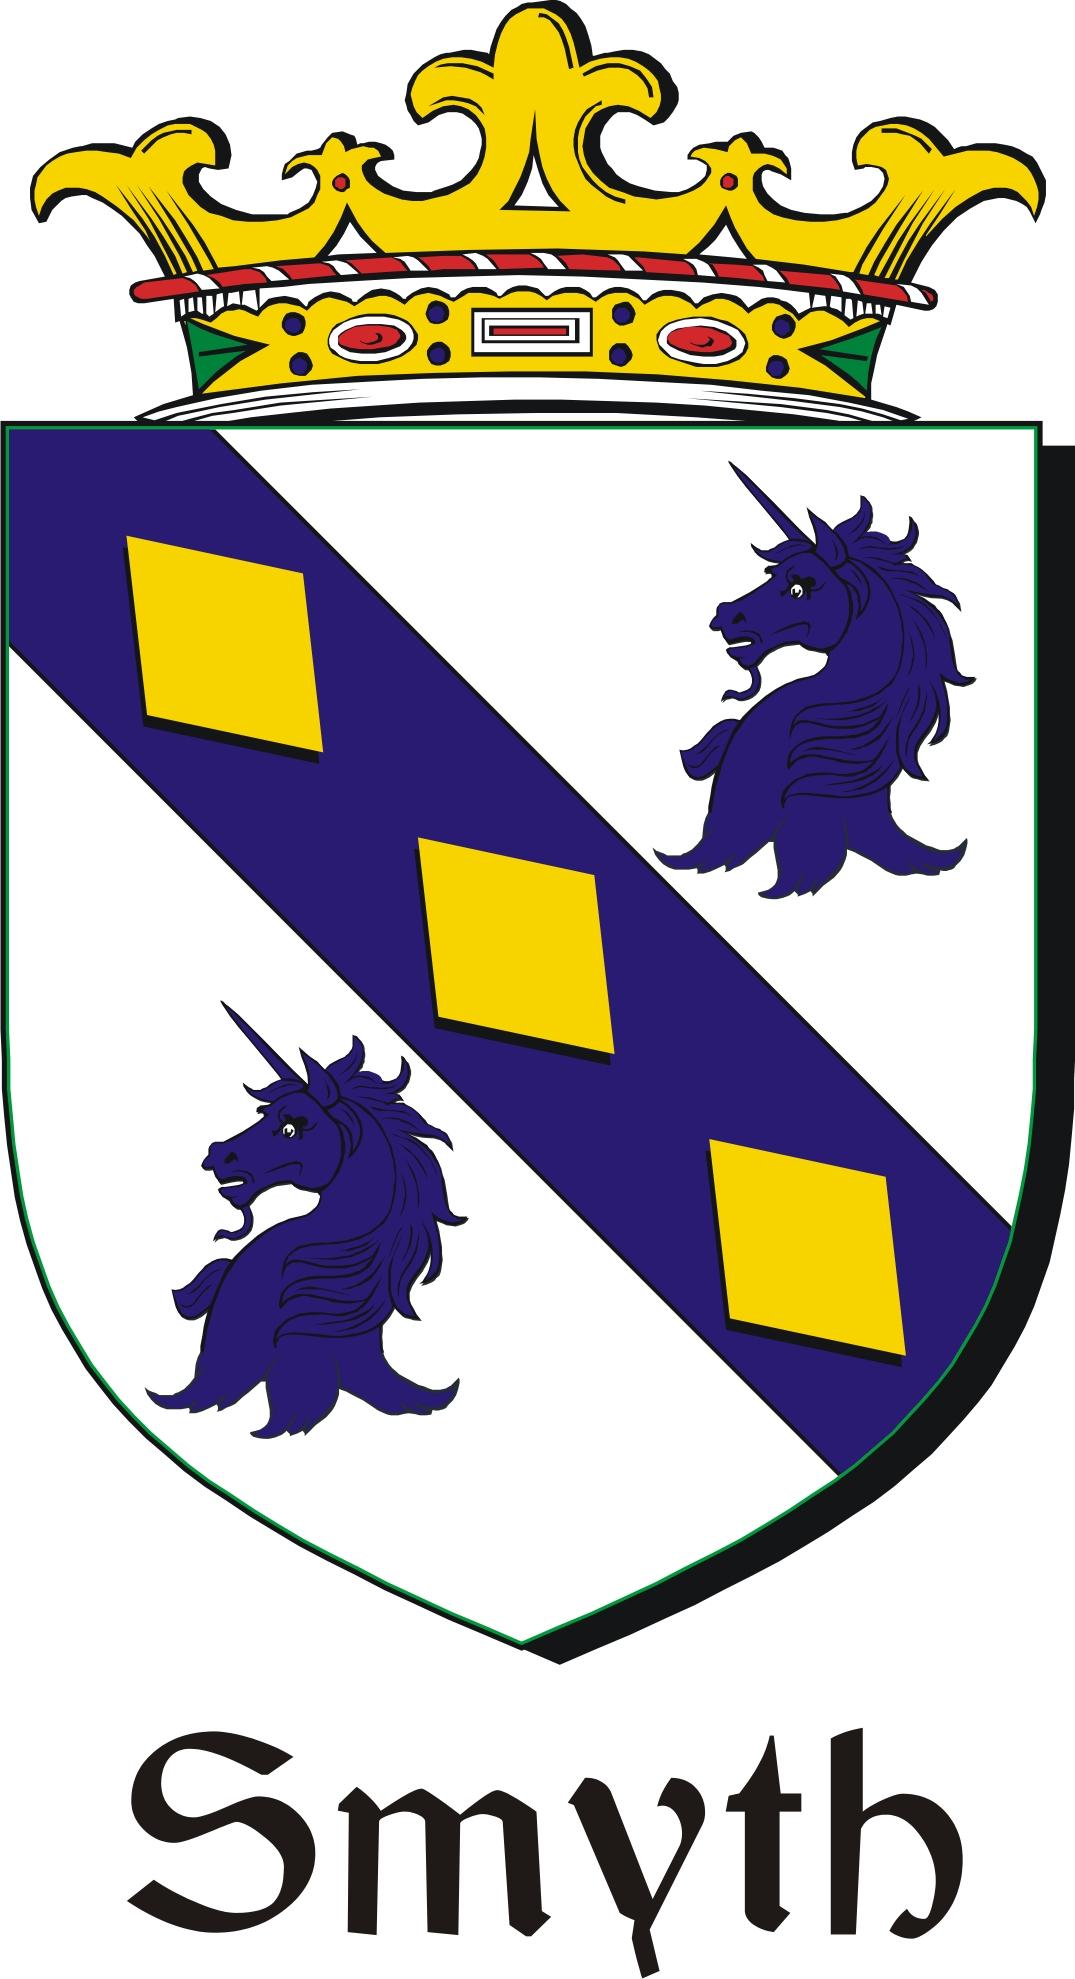 Smyth Family Crest Irish Coat Of Arms Image Download